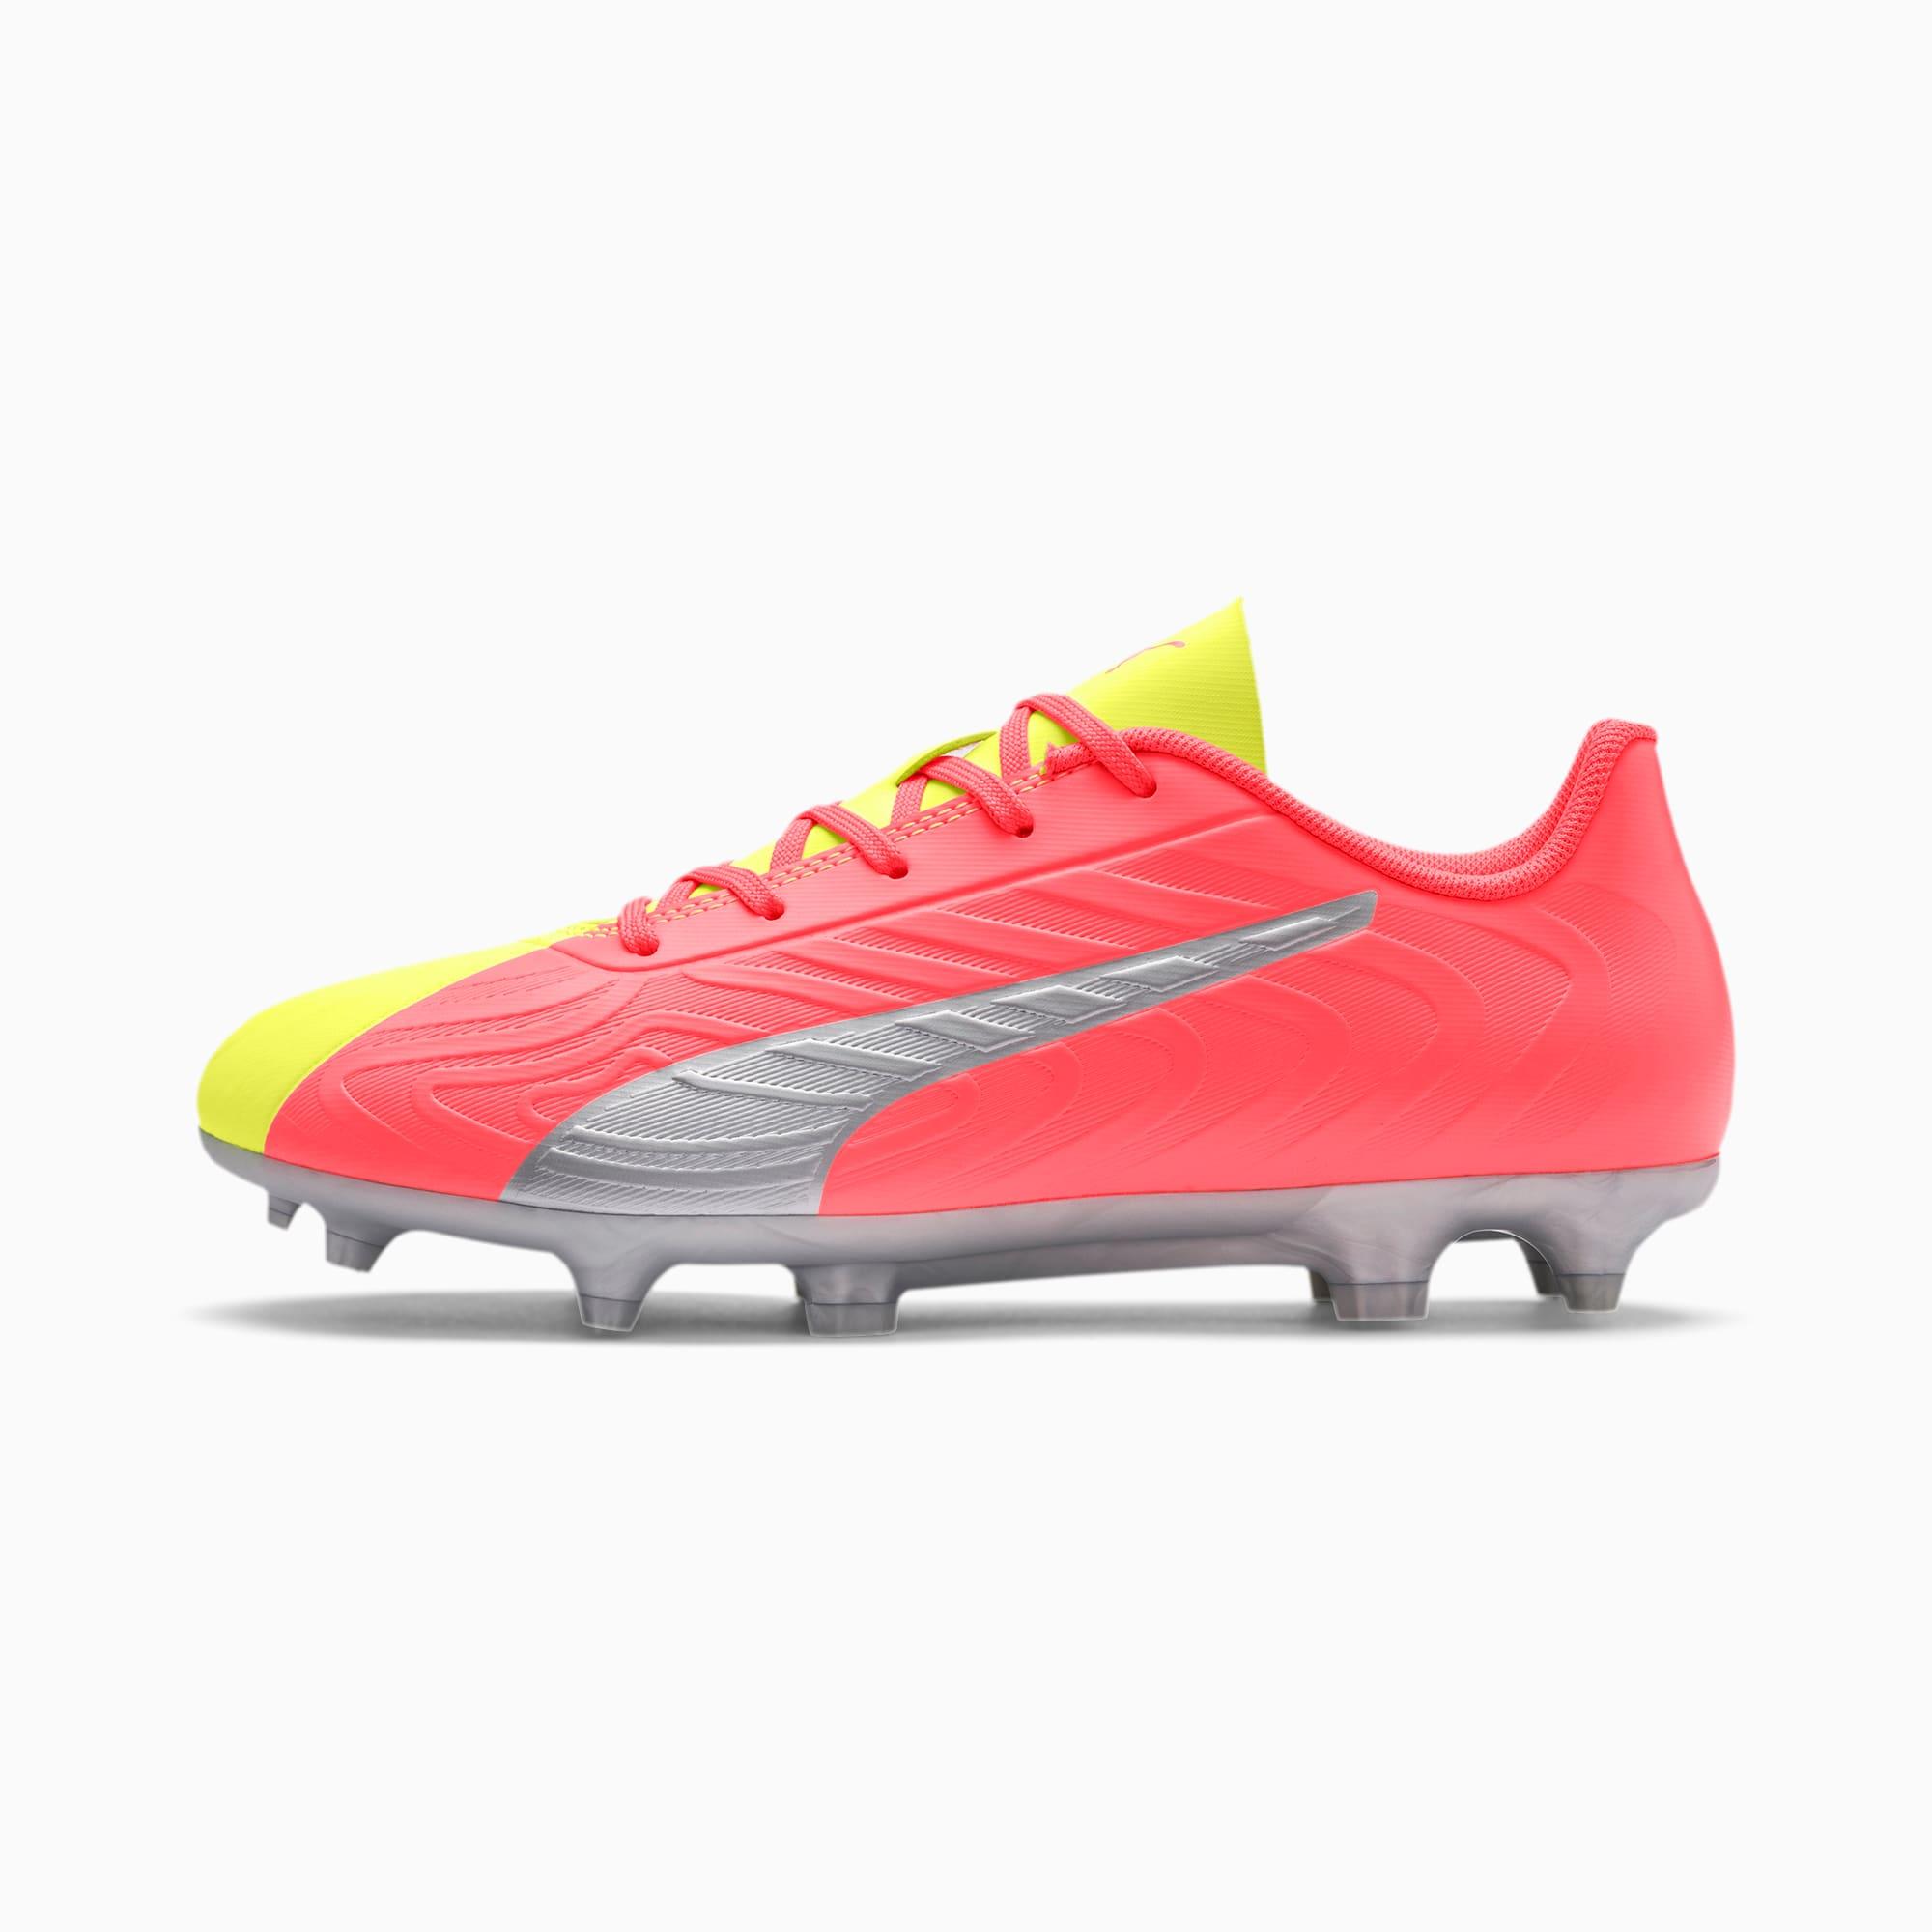 PUMA ONE 20.4 FG/AG Soccer Cleats JR